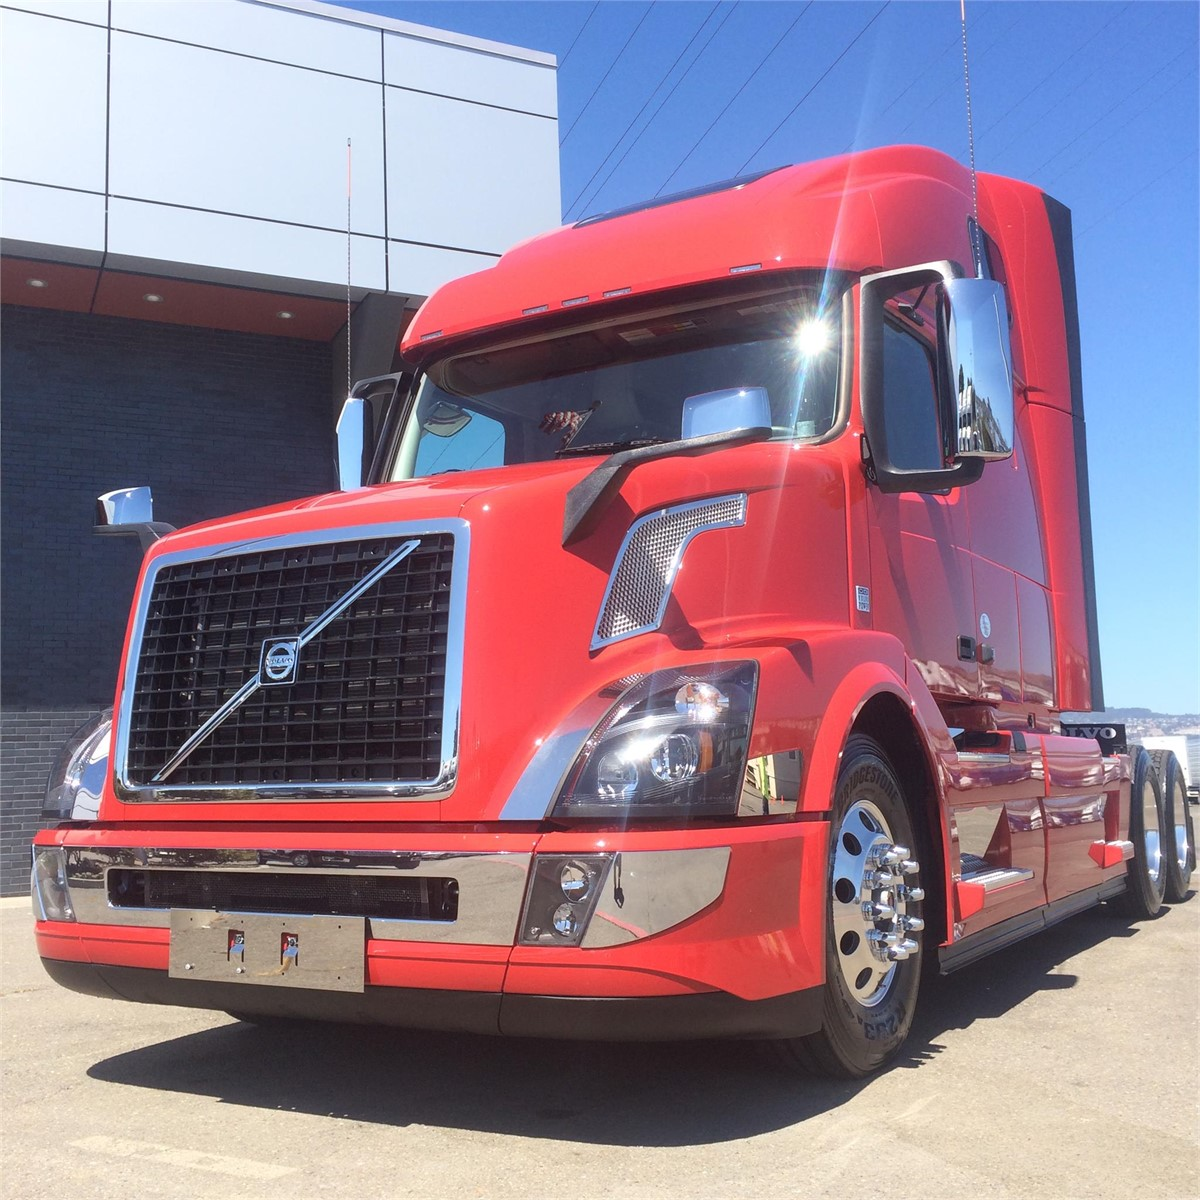 Volvo 780 Trucks For Sale: 2017 VOLVO VNL64T670 For Sale